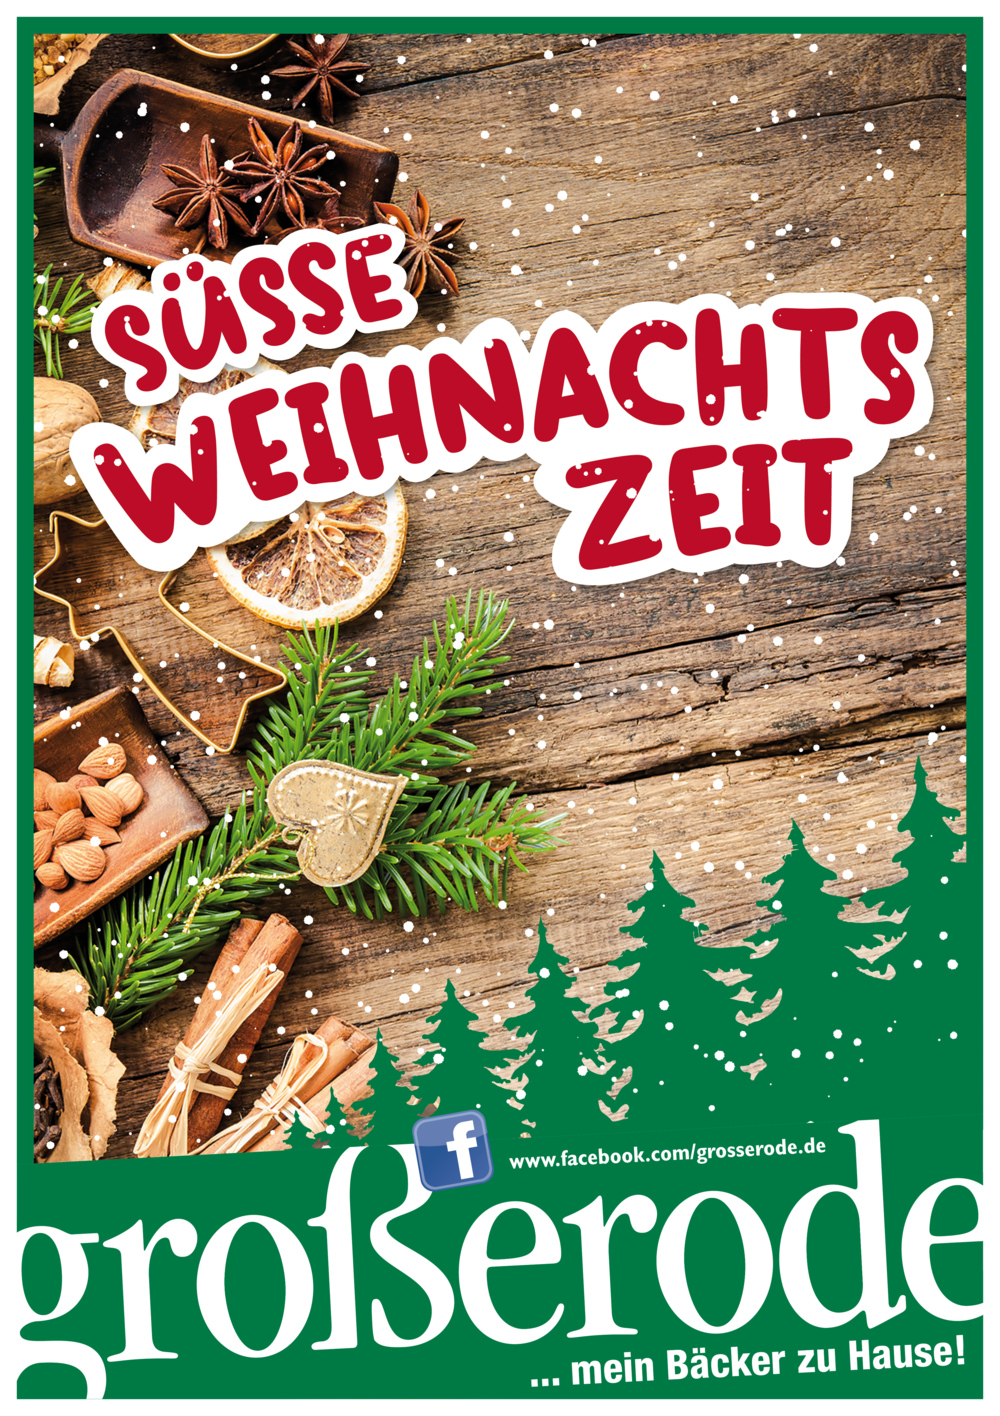 20161110_Grosserode_Weihnachten_A1_Druckdaten.png